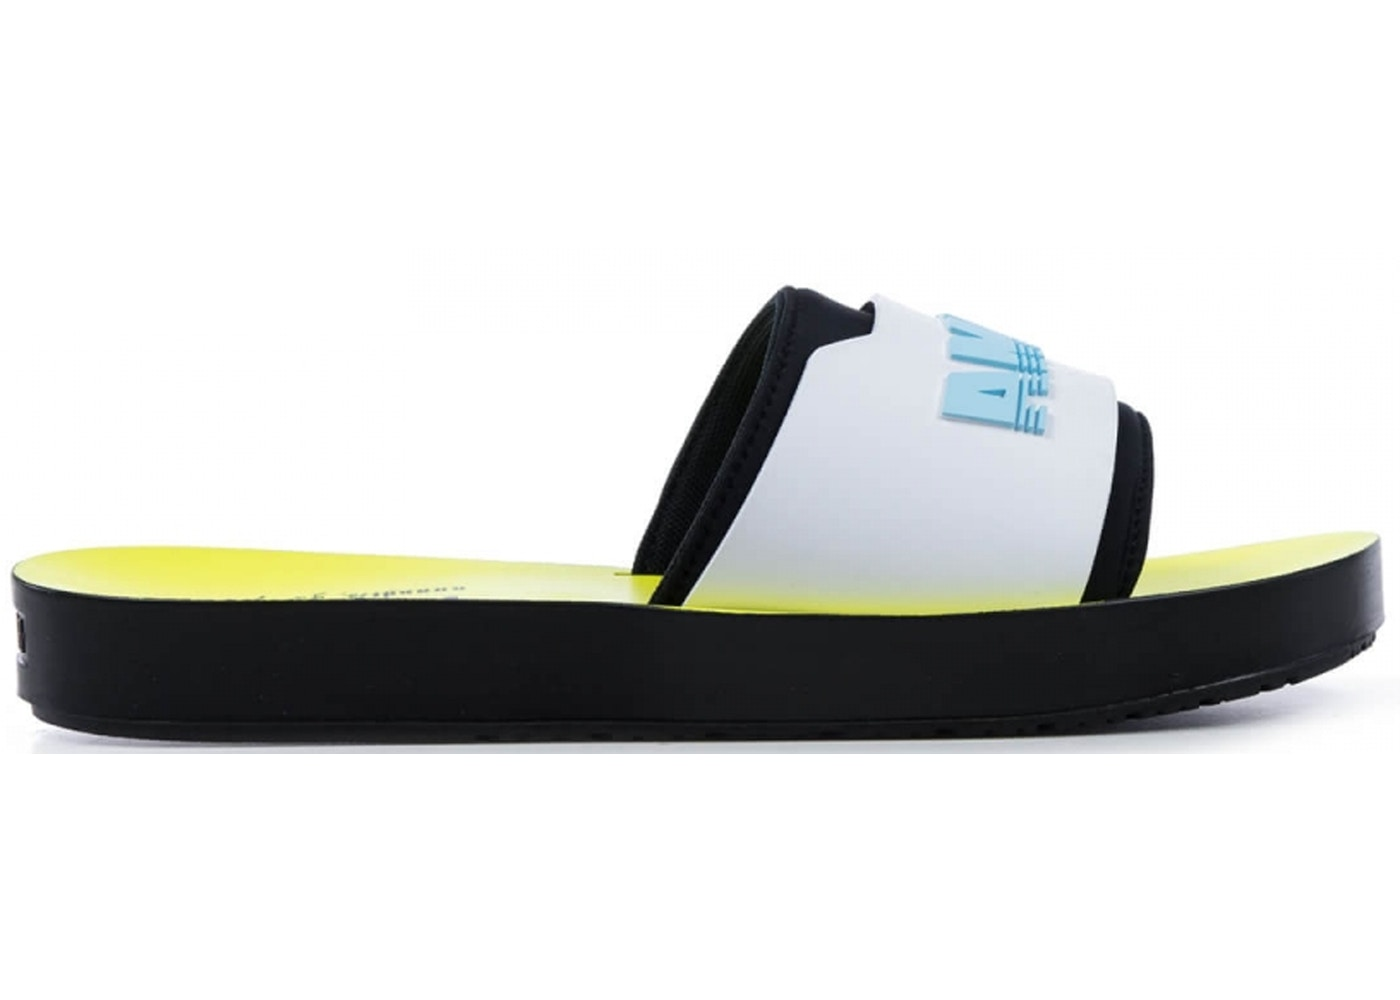 Puma Surf Slide Rihanna Fenty Black White Yellow (W) - 367747-02 82e8cefdc378